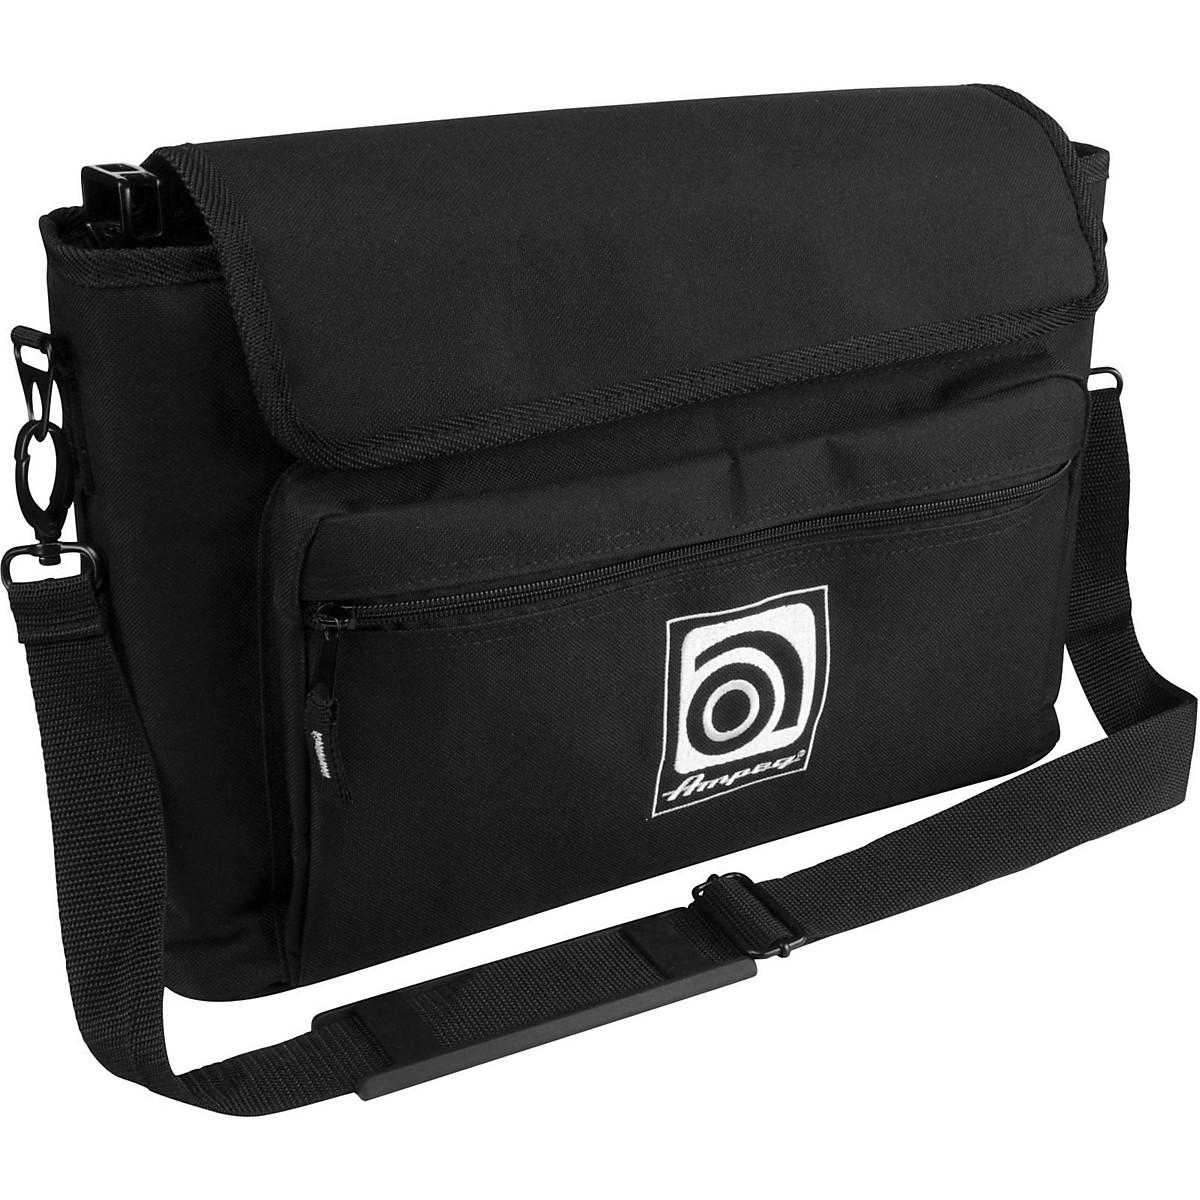 Ampeg Bag for PF-500 or PF-800 Portaflex Head